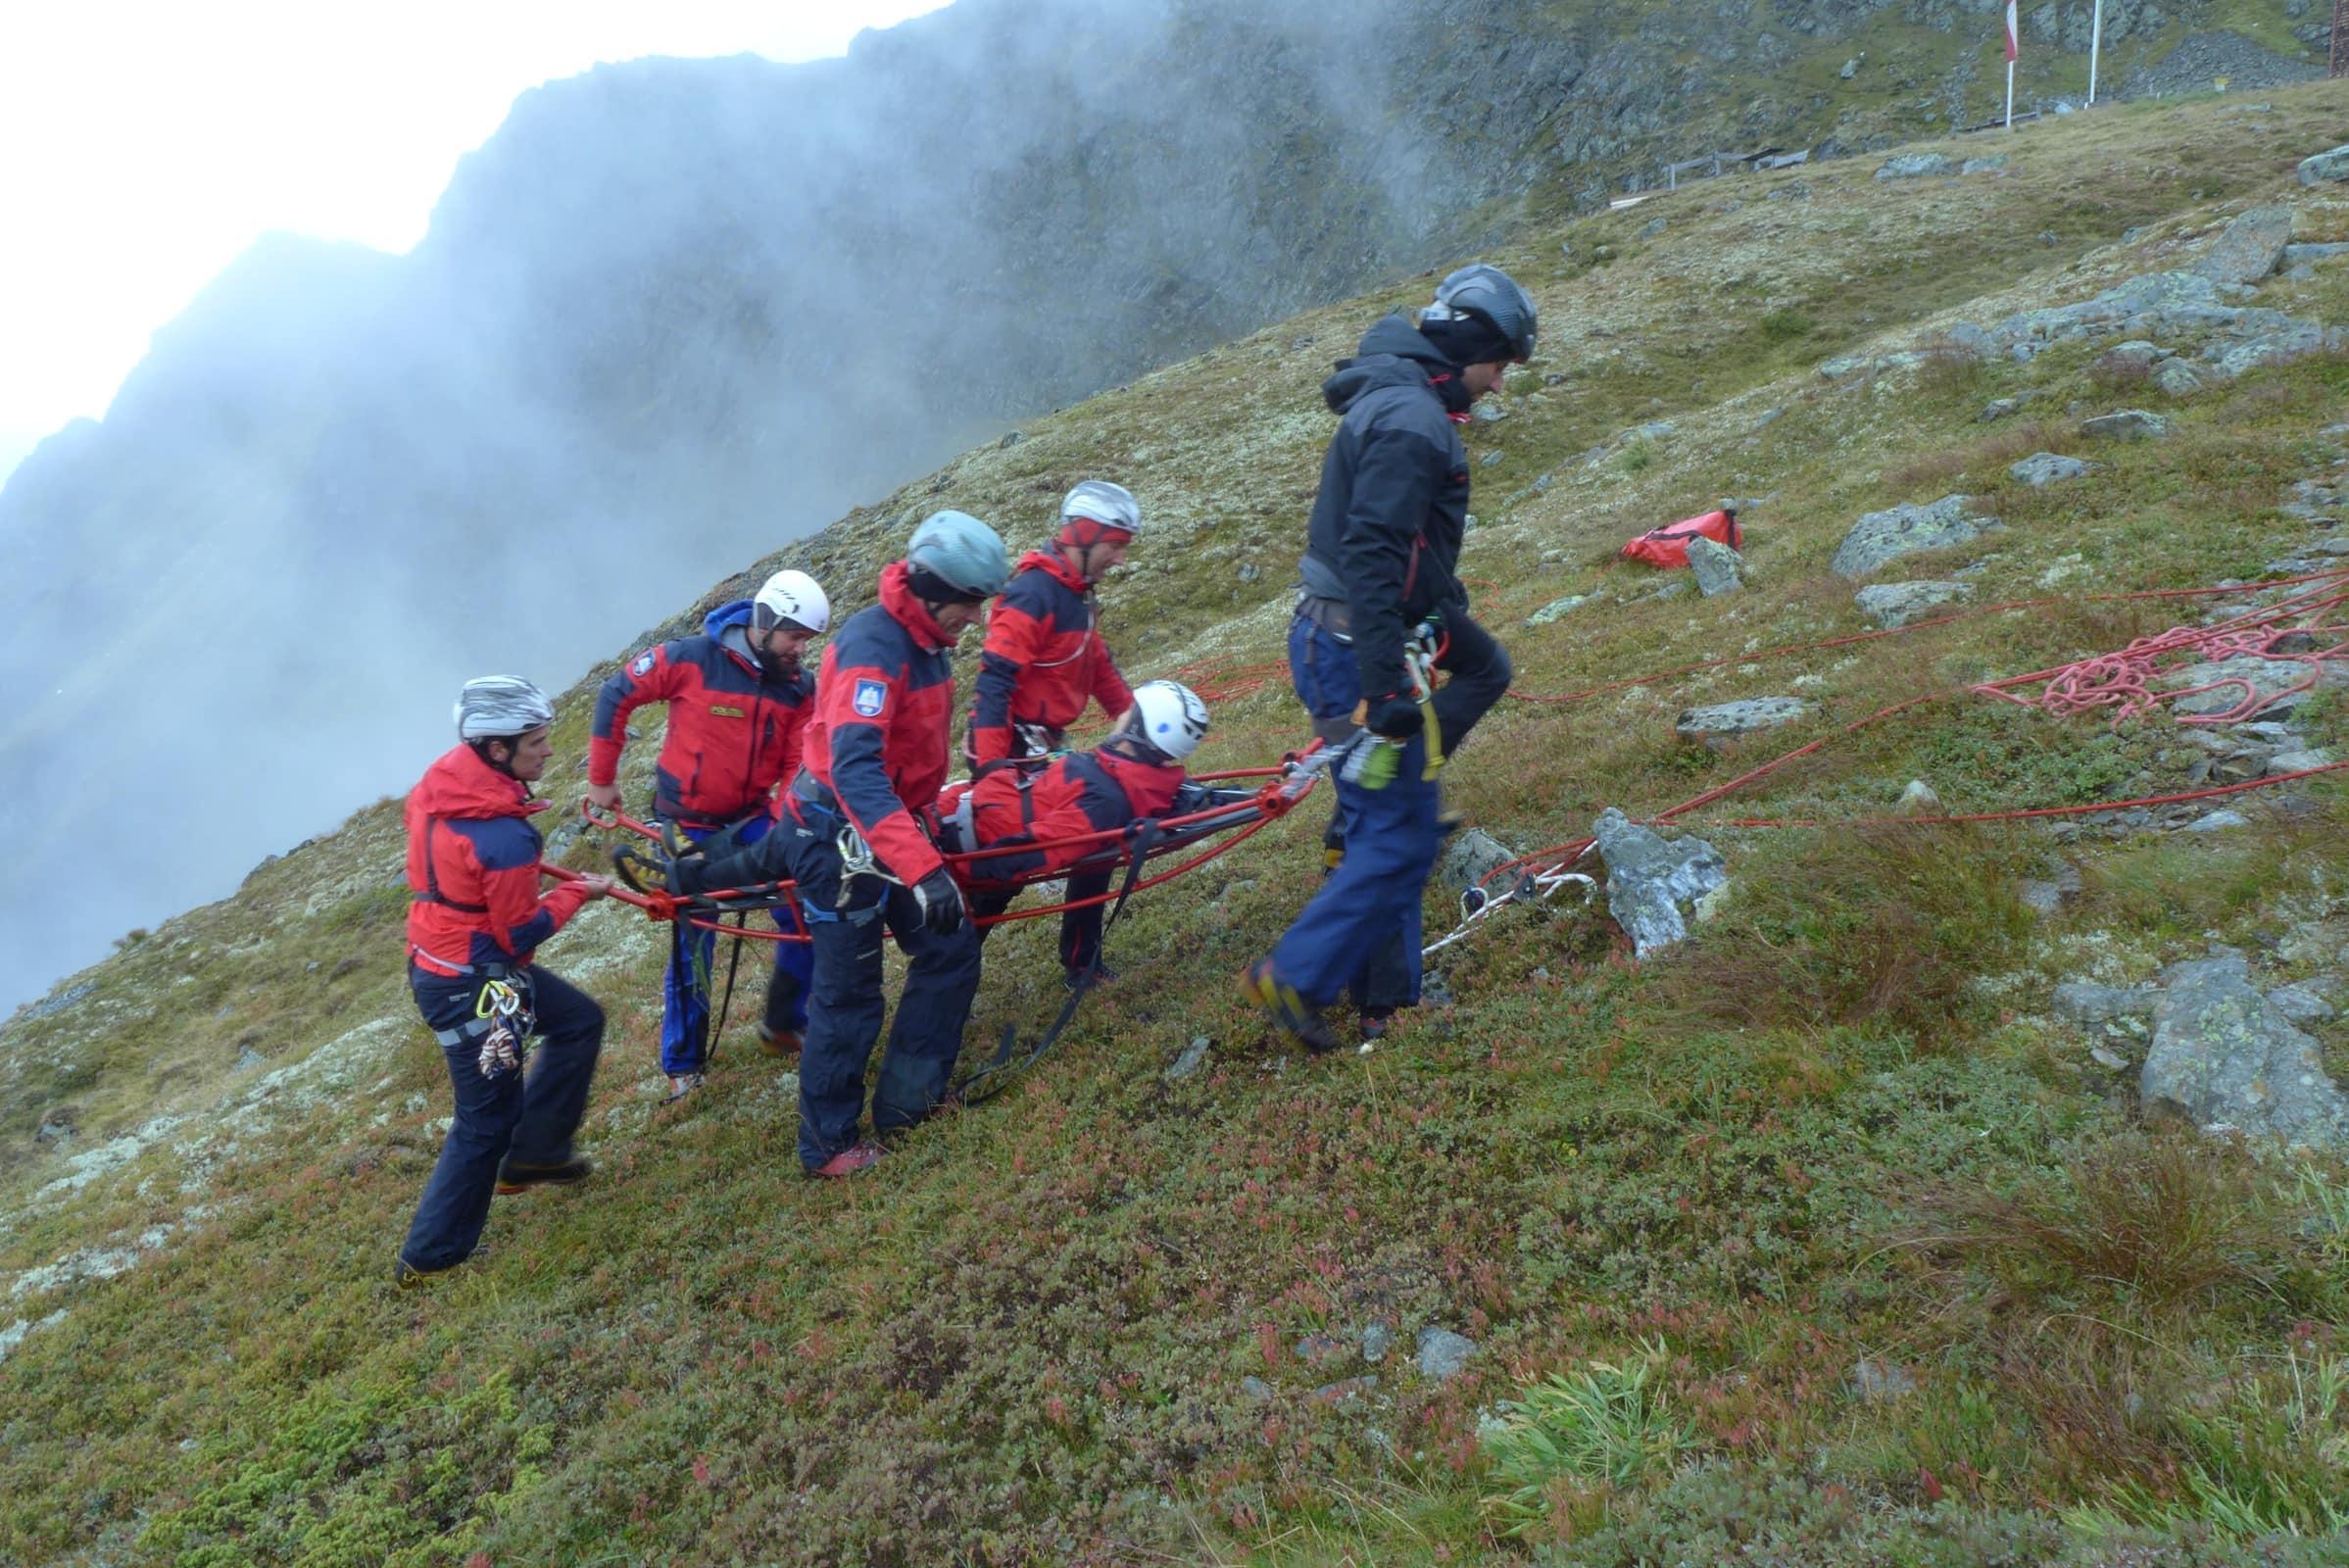 Verletztenbergung, Unterstützung der Bergrettung